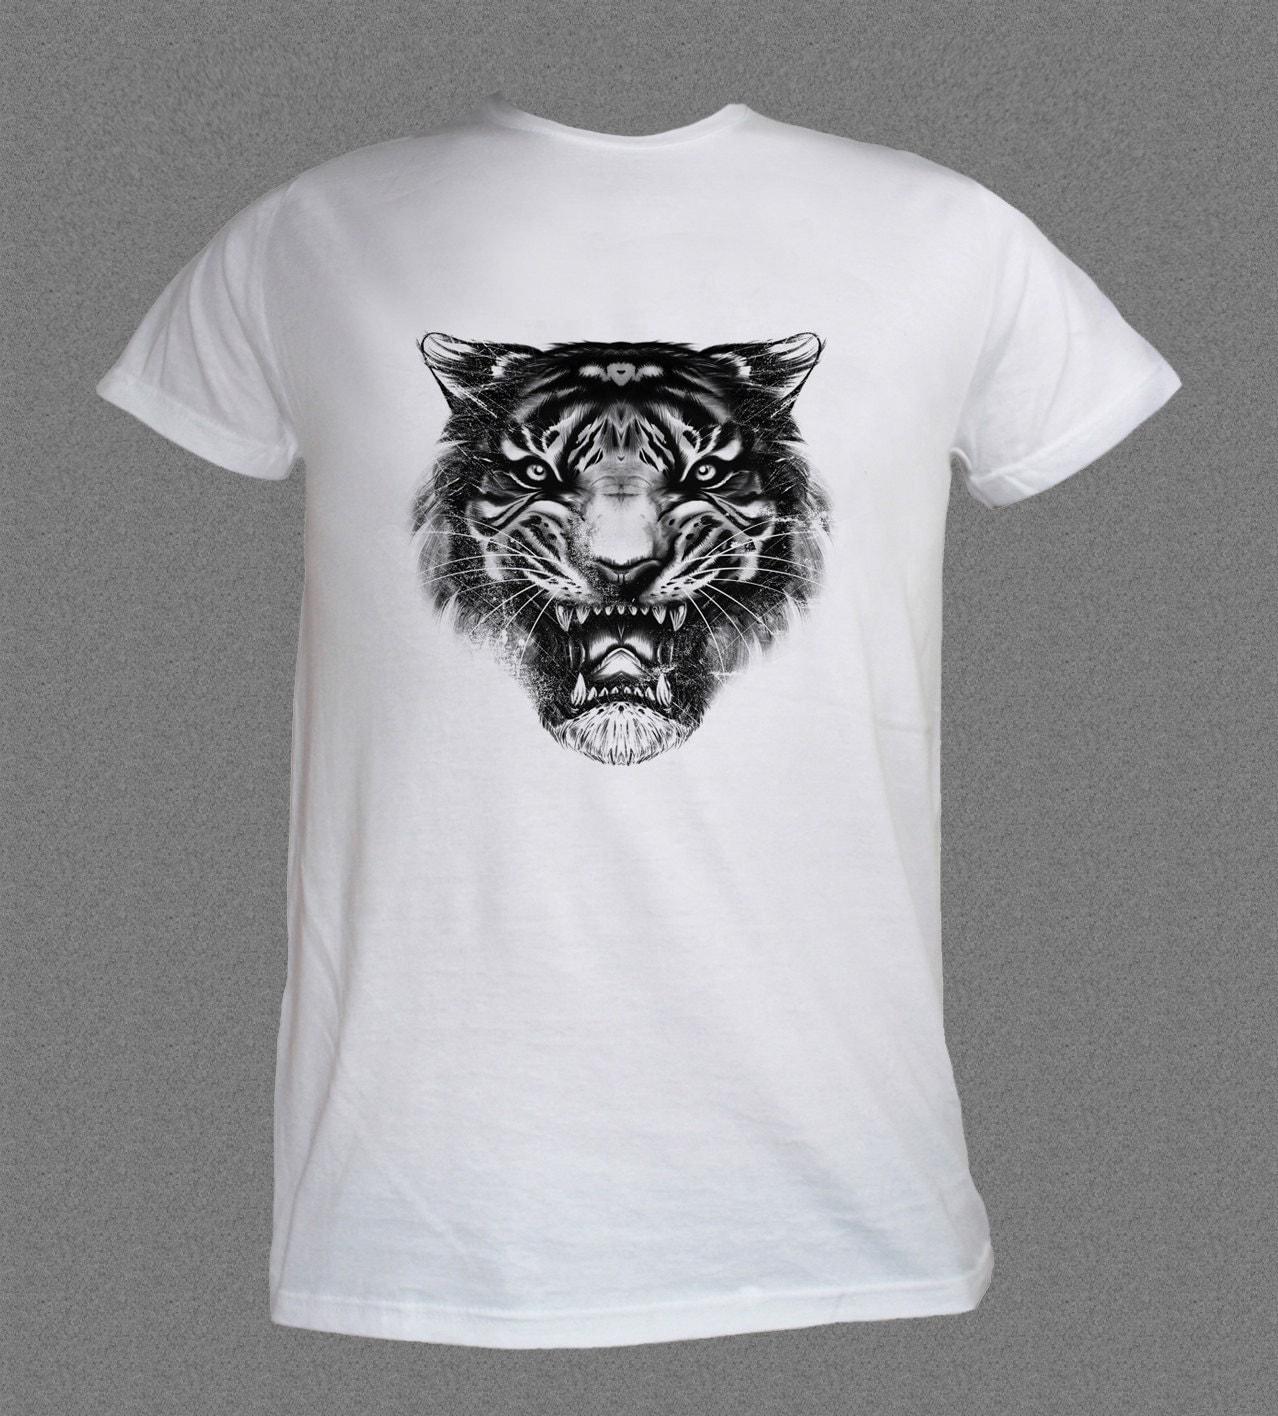 Angry Tiger Face Cat Nature Animal Tshirt